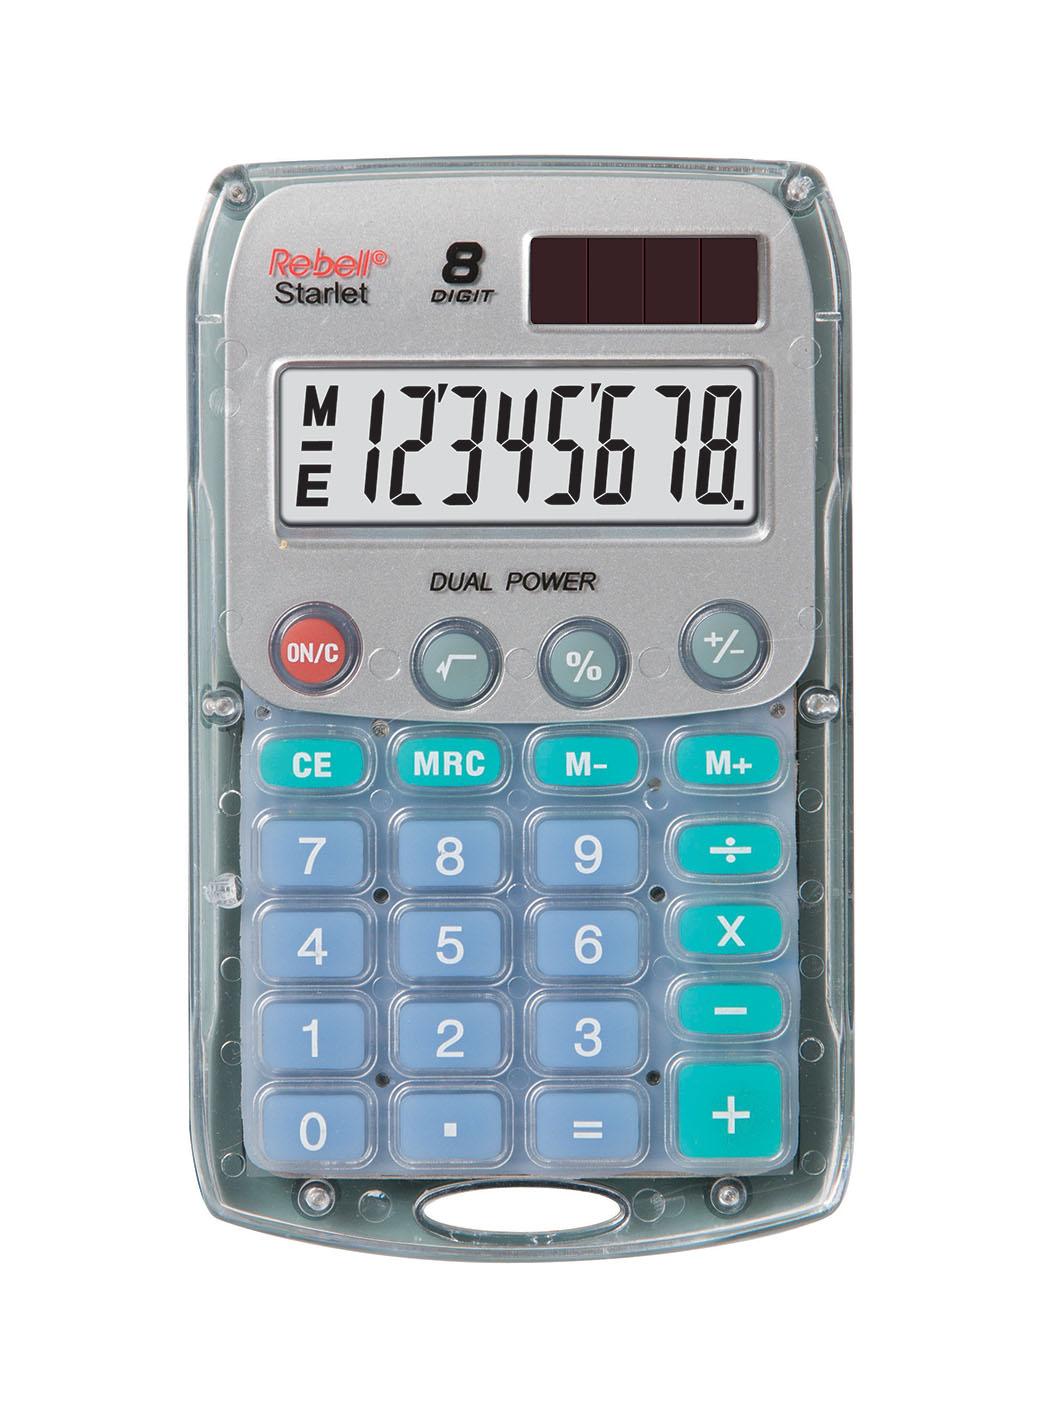 Rebell pocket calculator Starlet transparent